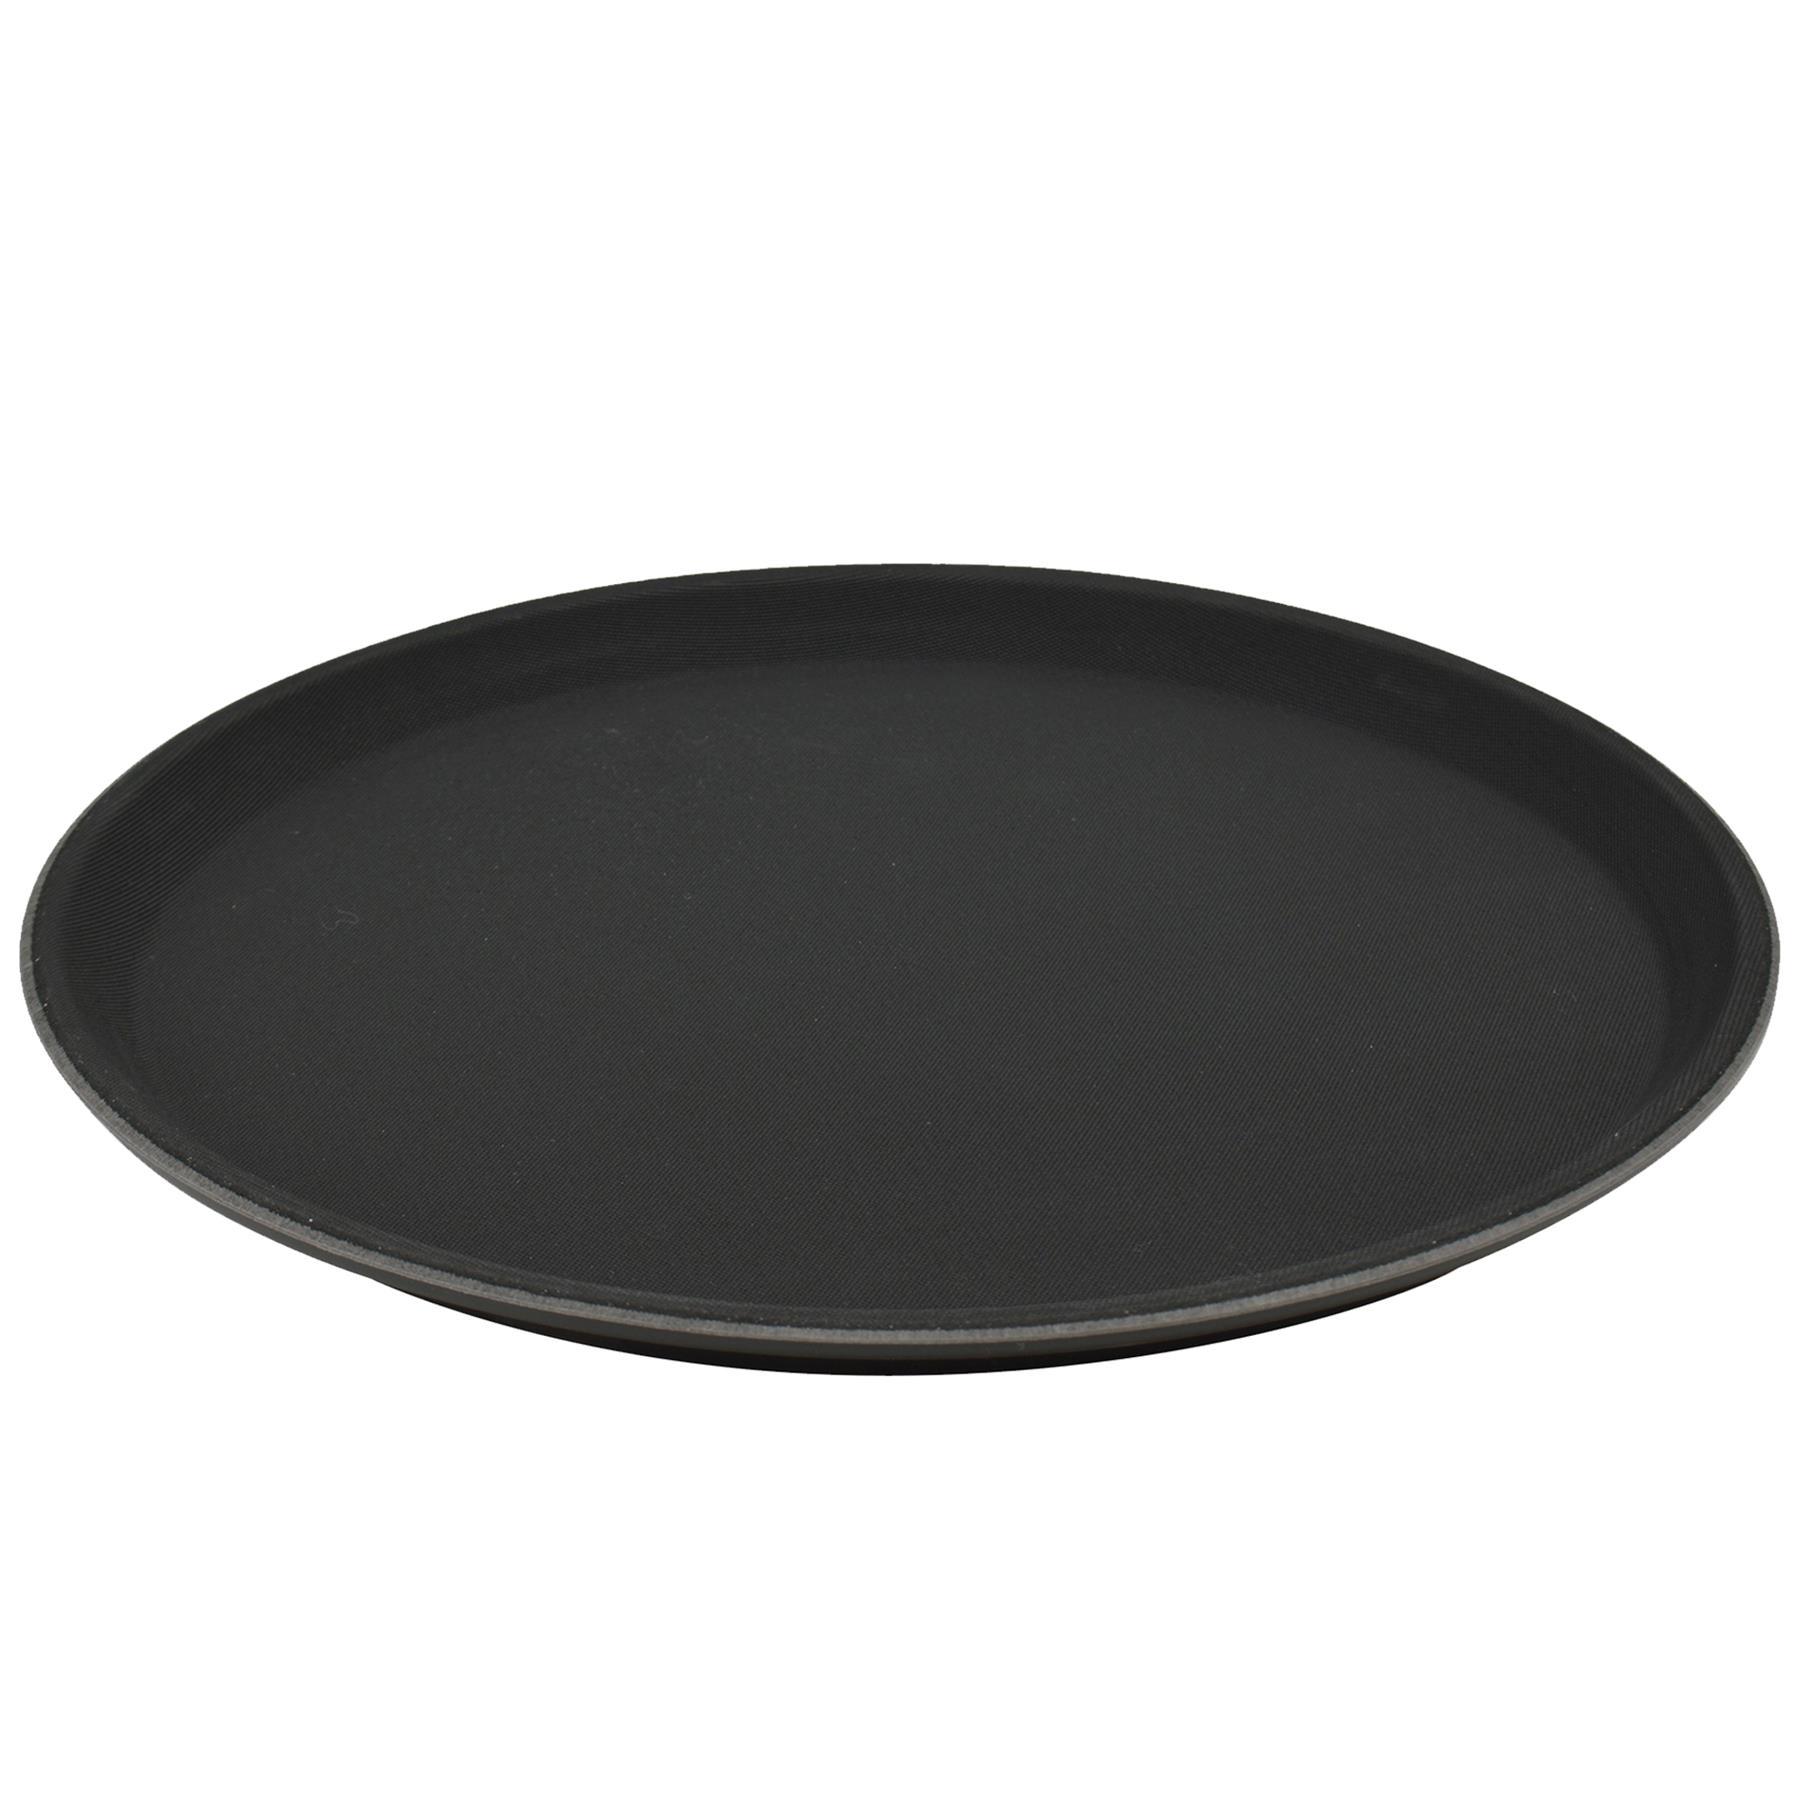 Non-Slip Round Tray Bar Pub Café Waiter Serving Dinner Drinks Food Platter